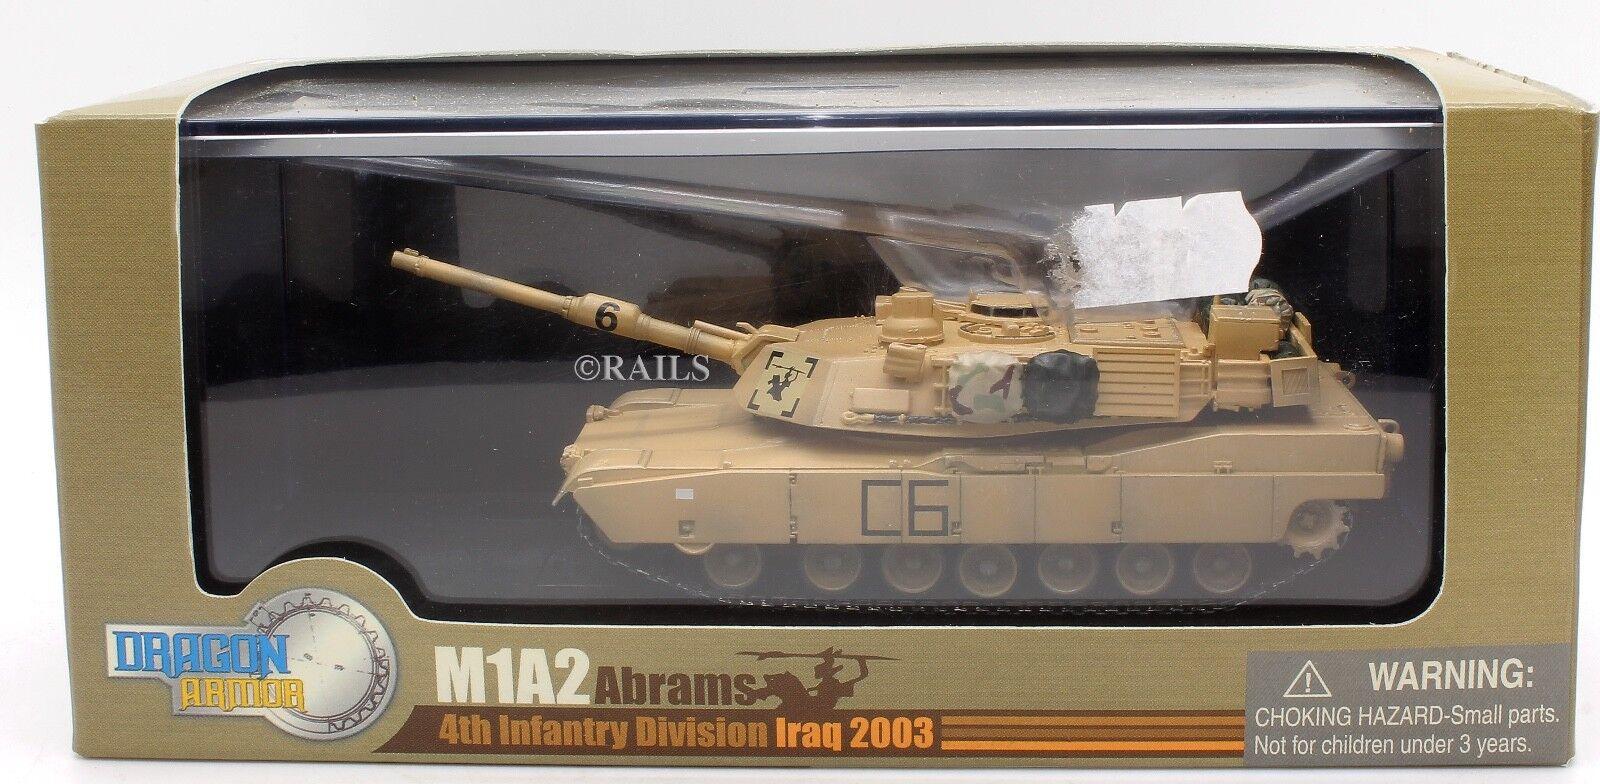 DRAGON ARMOR 1 72 60016 M1A2 ABRAMS 4TH INFANTRY DIVISION IRAQ 2003 (S21)